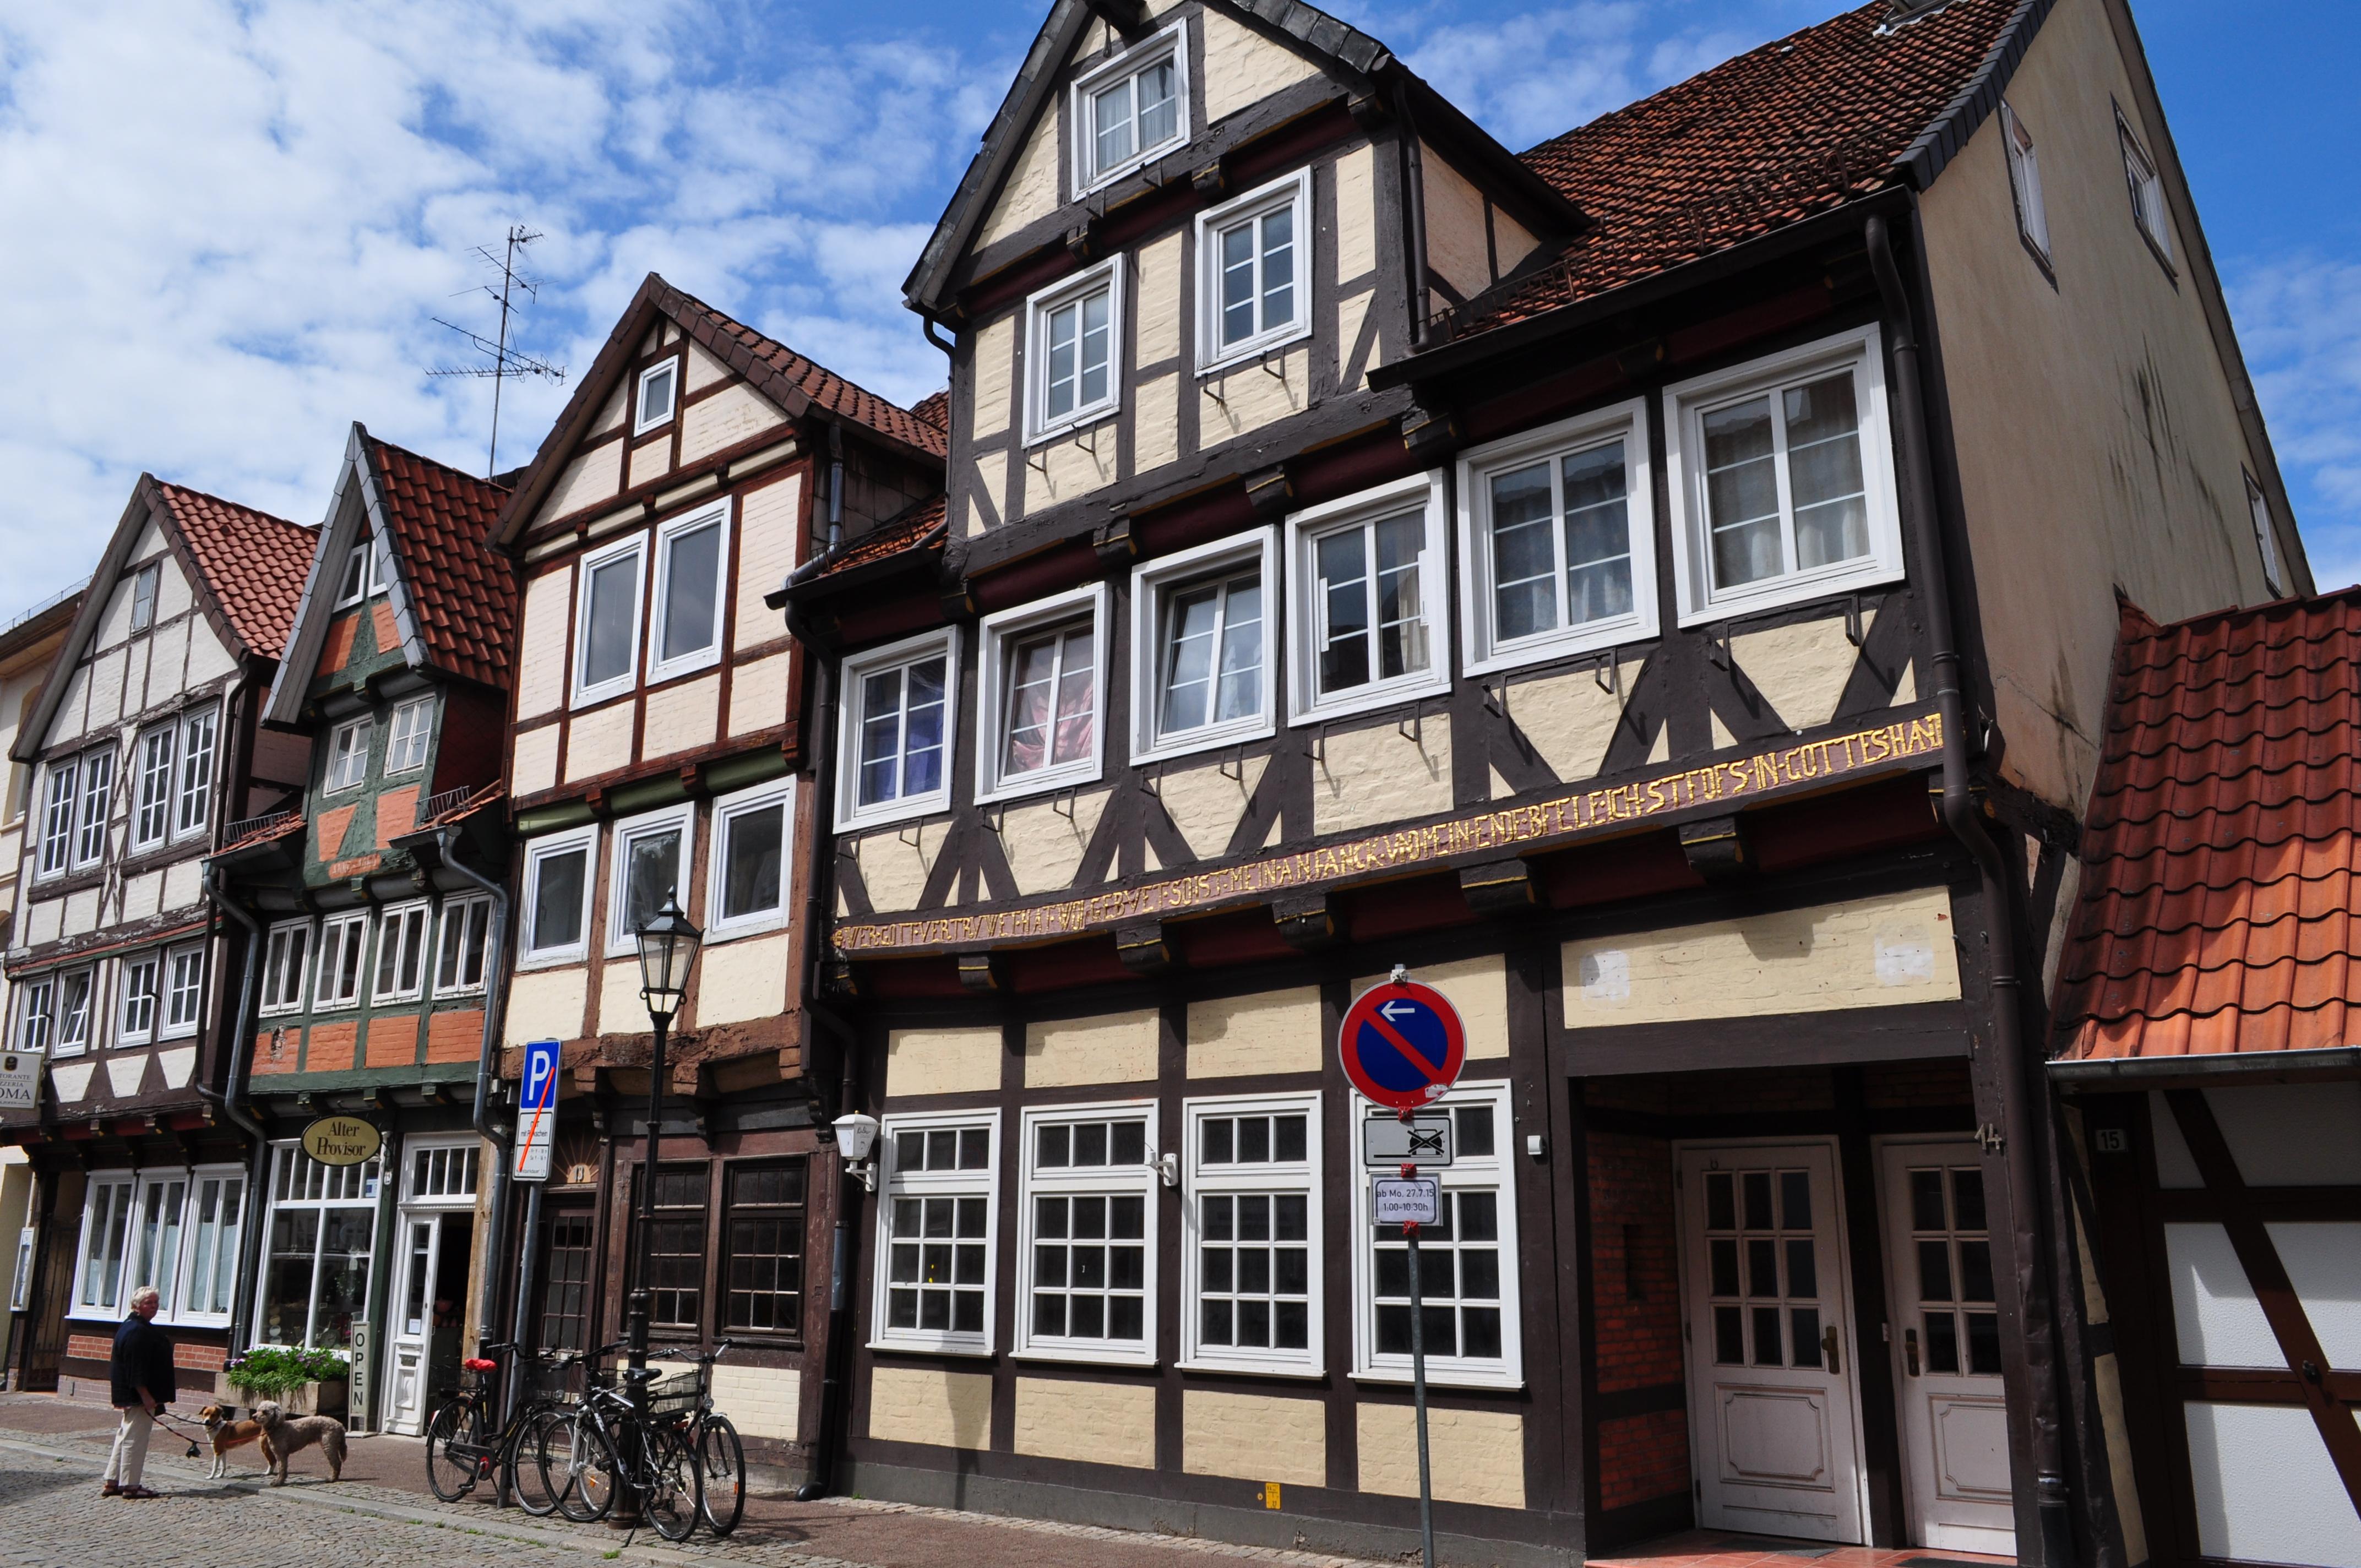 Sfondi citt casa germania deutschland cittadina casa europa maisons unione europea - Casa in germania ...